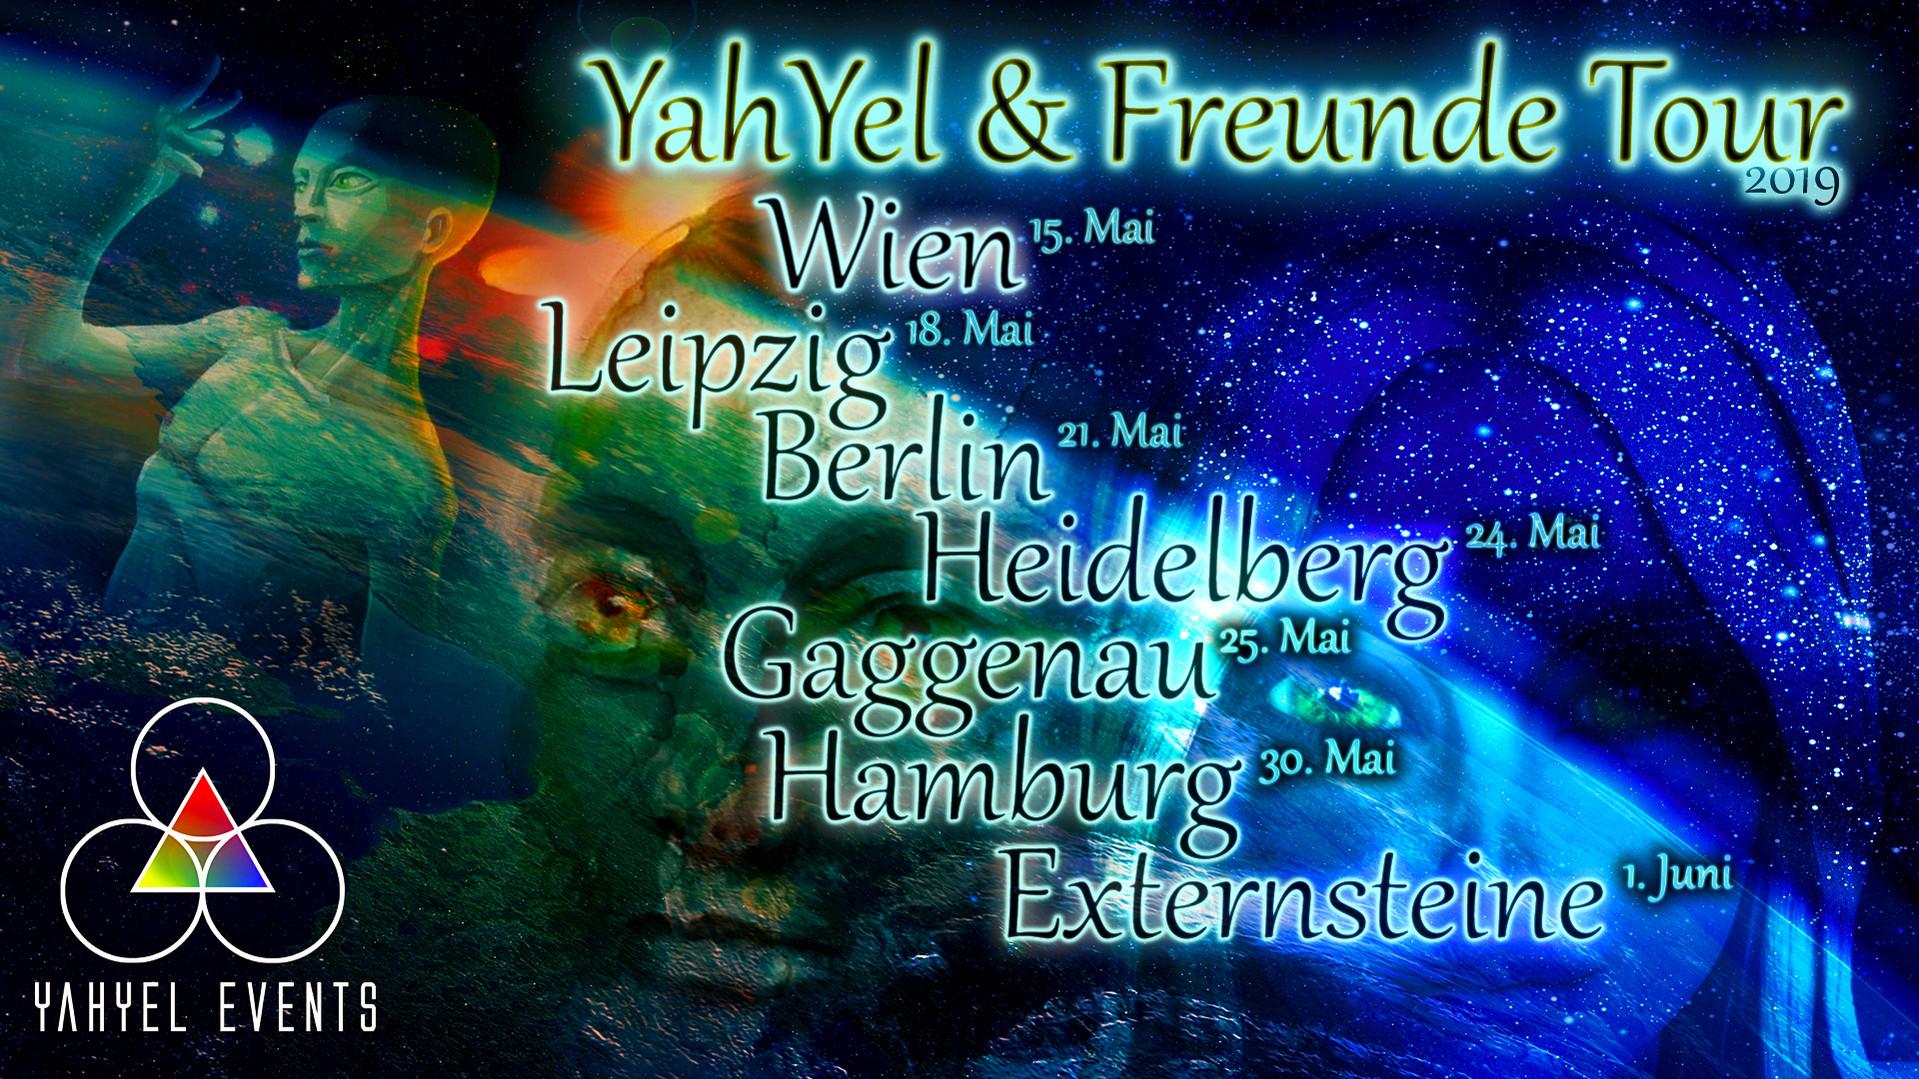 yahyelundfreundetour2019daten2 Kopie2.jp